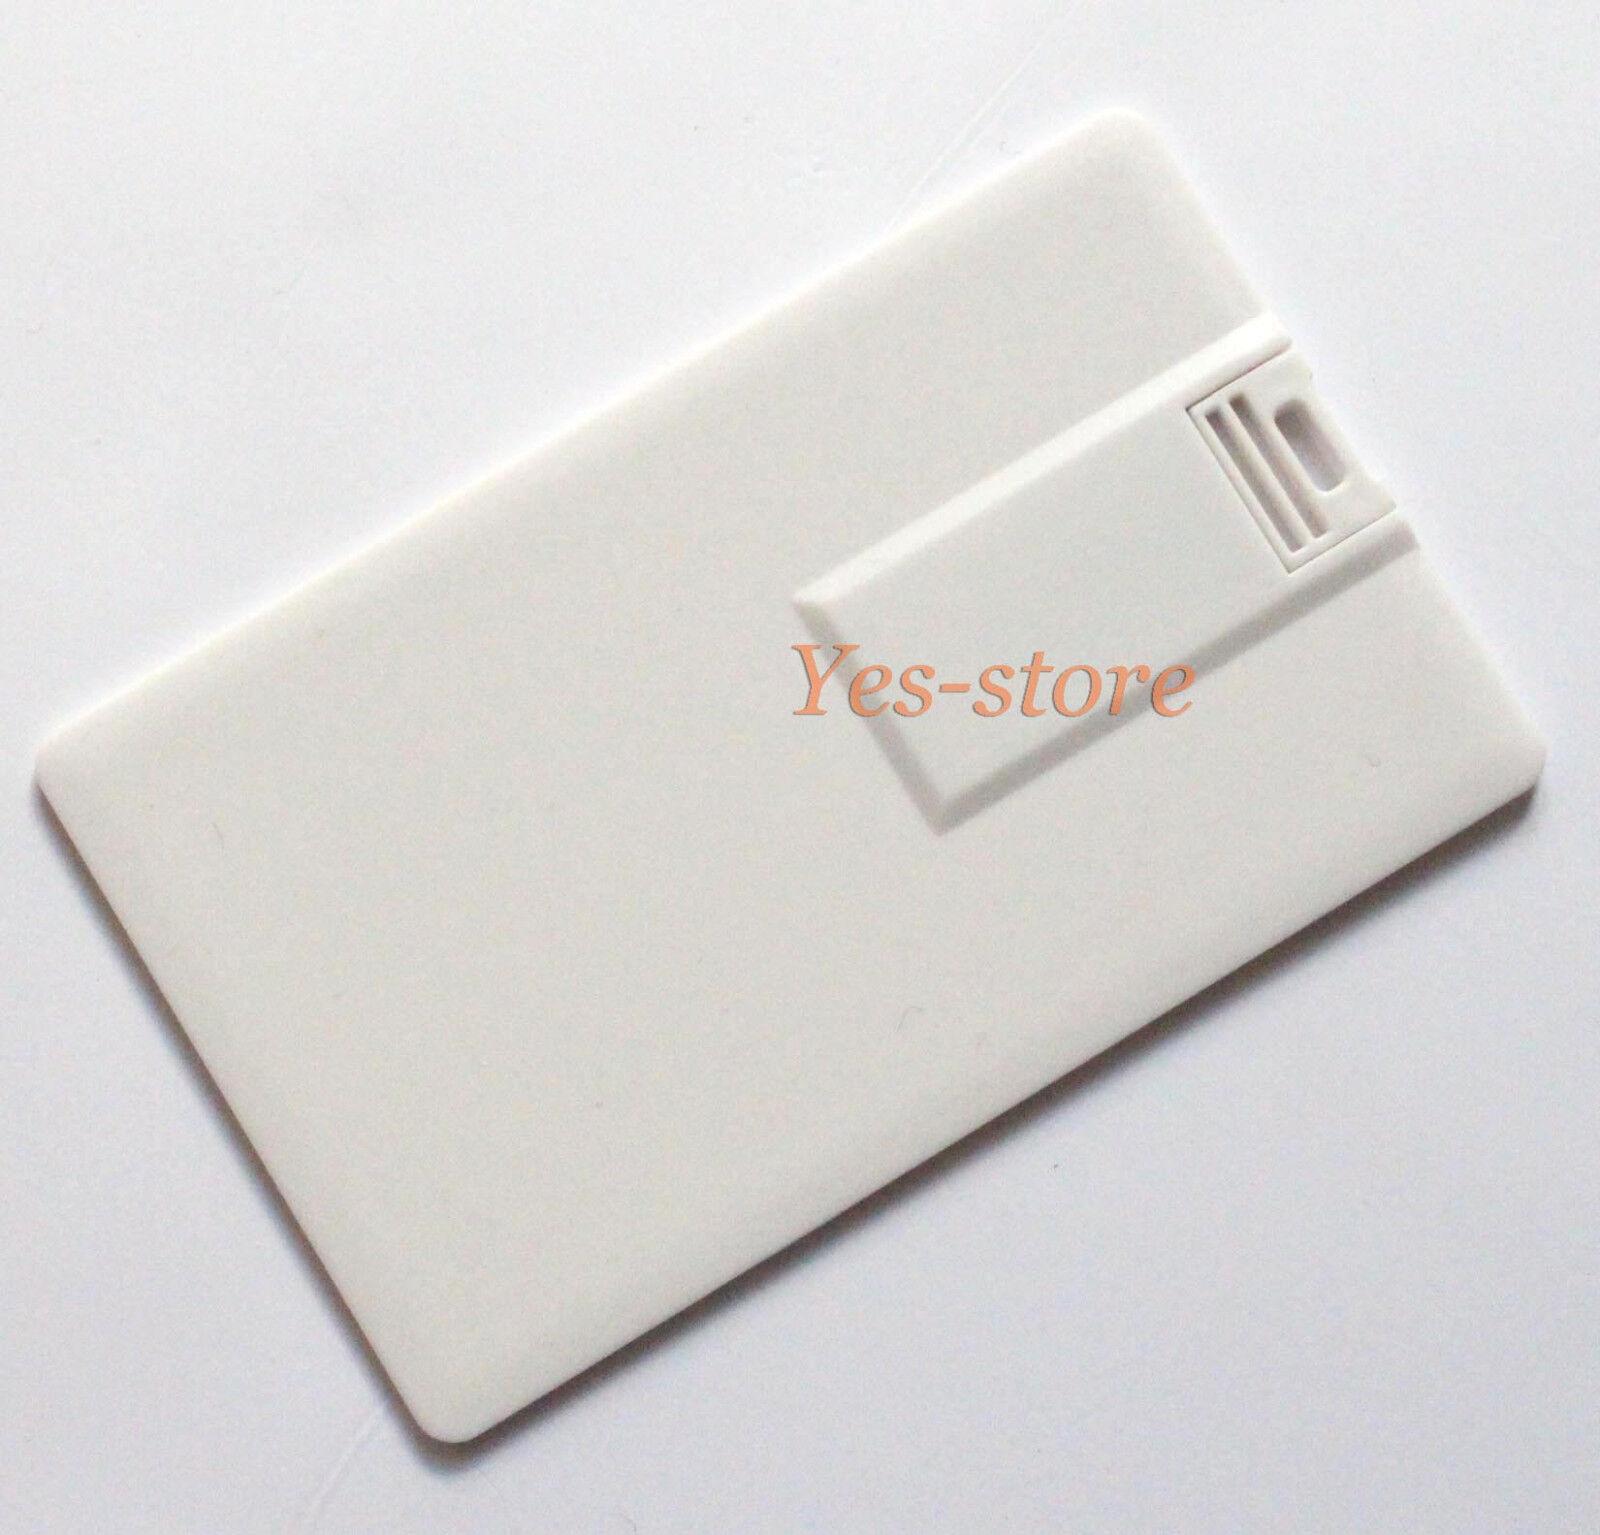 100pcs usb stick flash pen drive 8gb 8g blank business. Black Bedroom Furniture Sets. Home Design Ideas